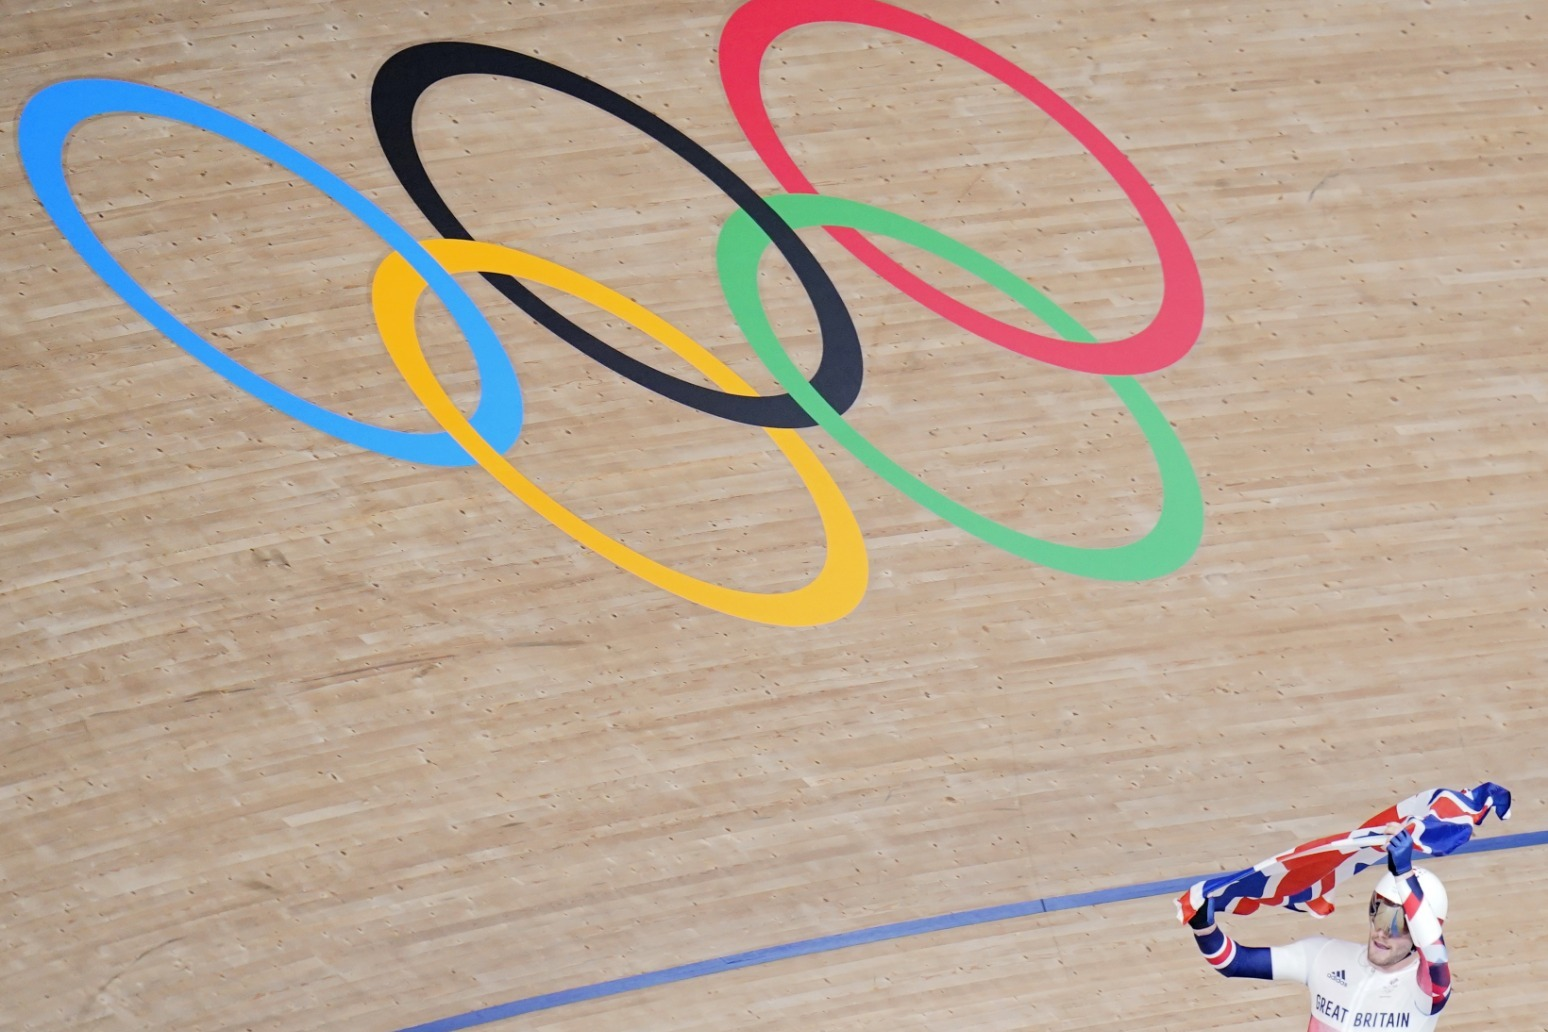 Next stop Paris as Tokyo Olympics come to a close